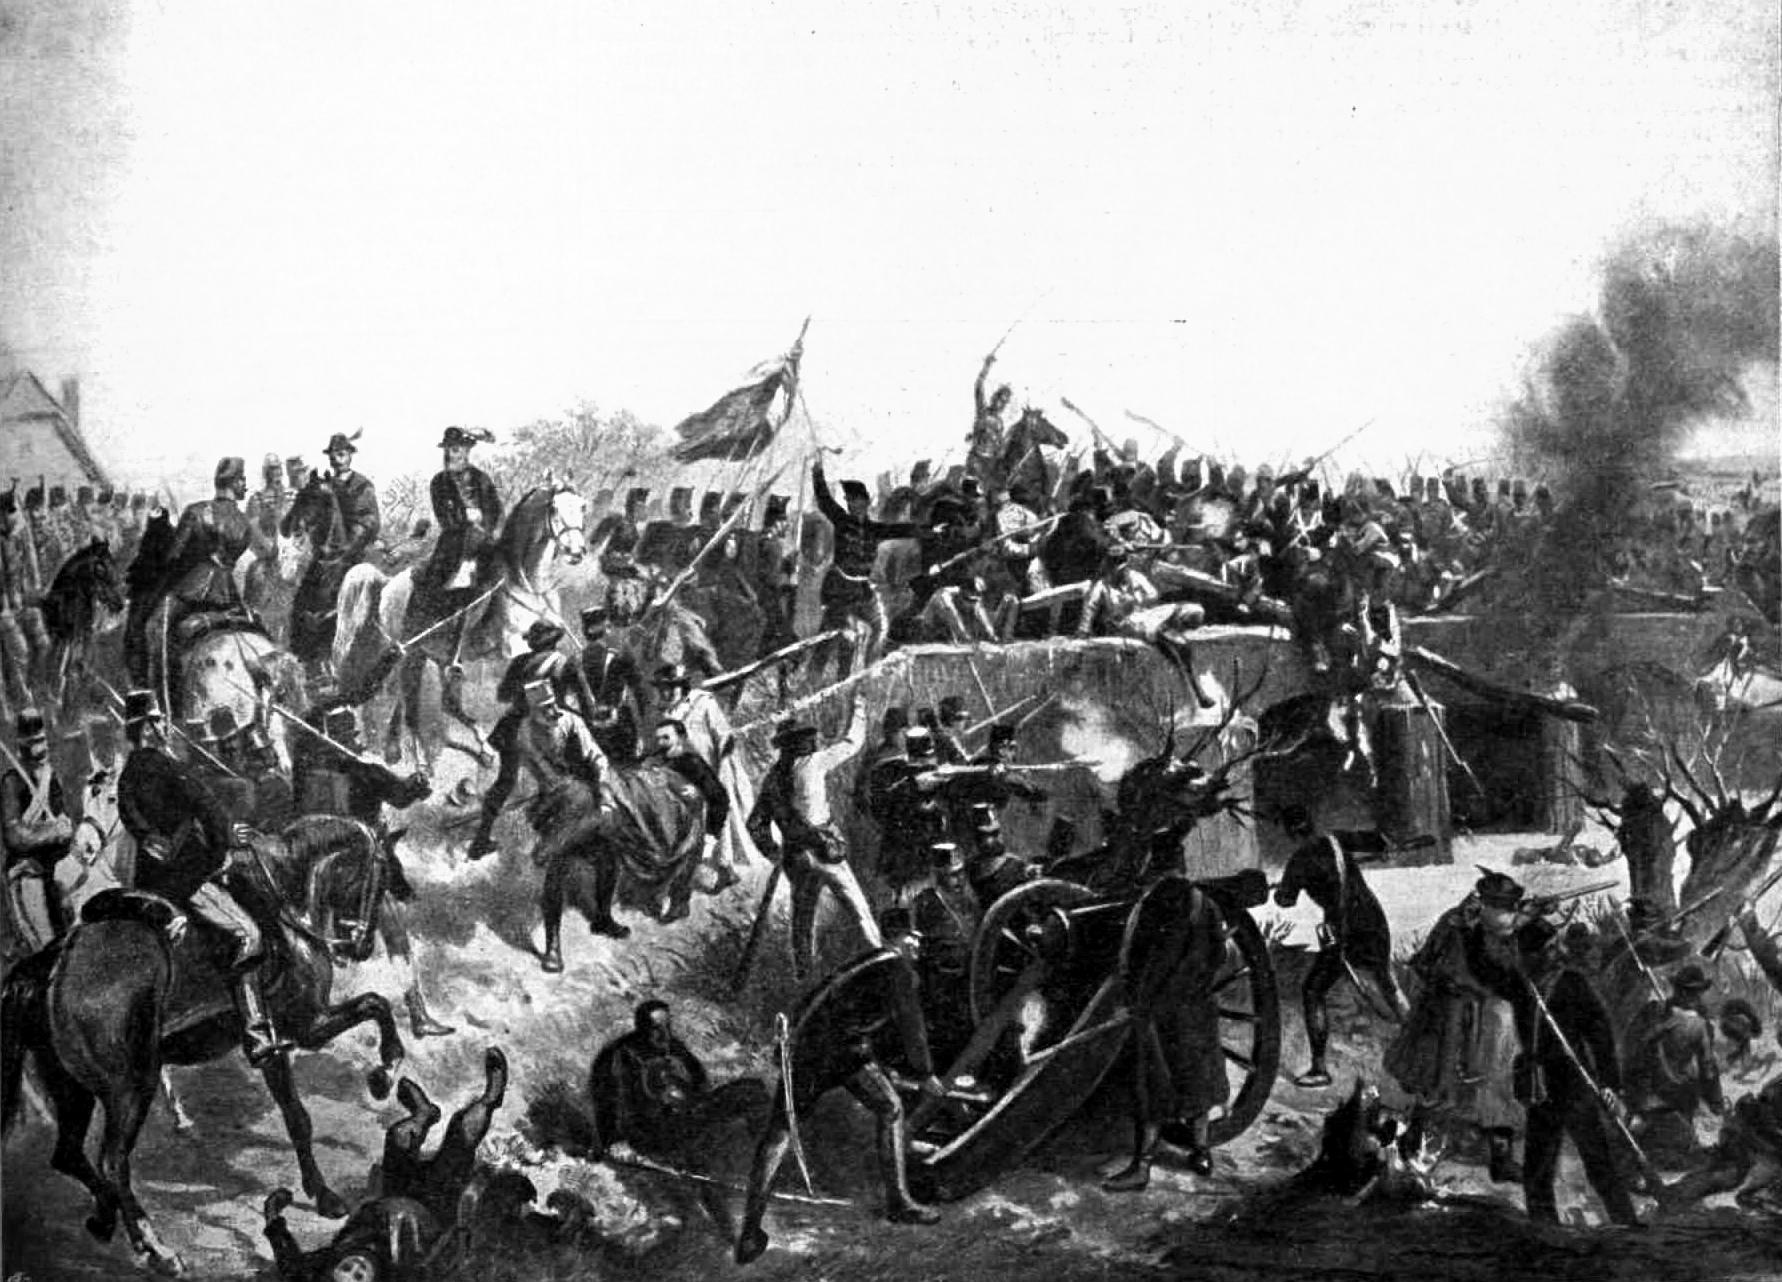 breidwieser-_a_piski_csata_1849_februar_9.jpg